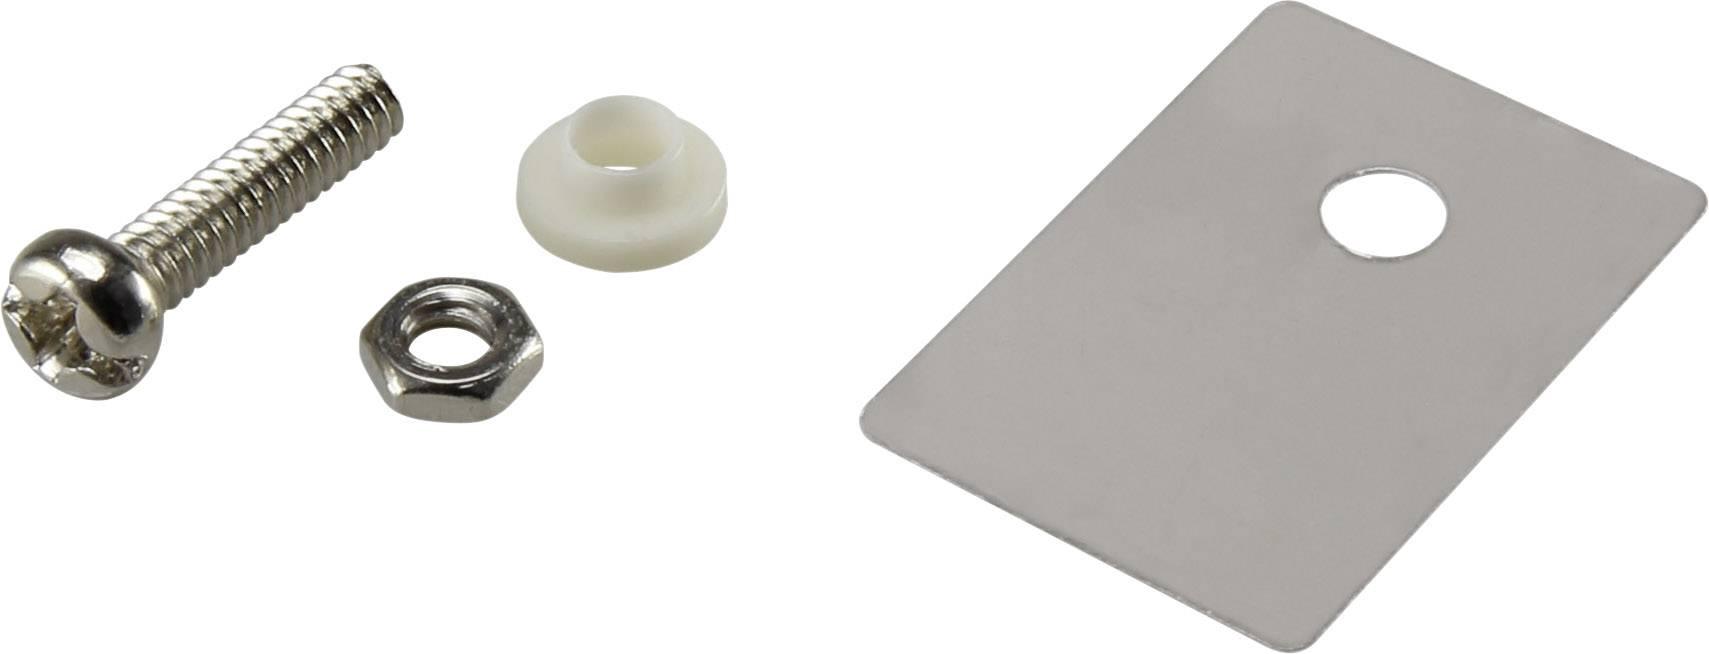 Sada montážního materiálu pro polovodiče TRU COMPONENTS TC-A18-10D, (d x š) 22.3 mm x 15.2 mm, 1 sada